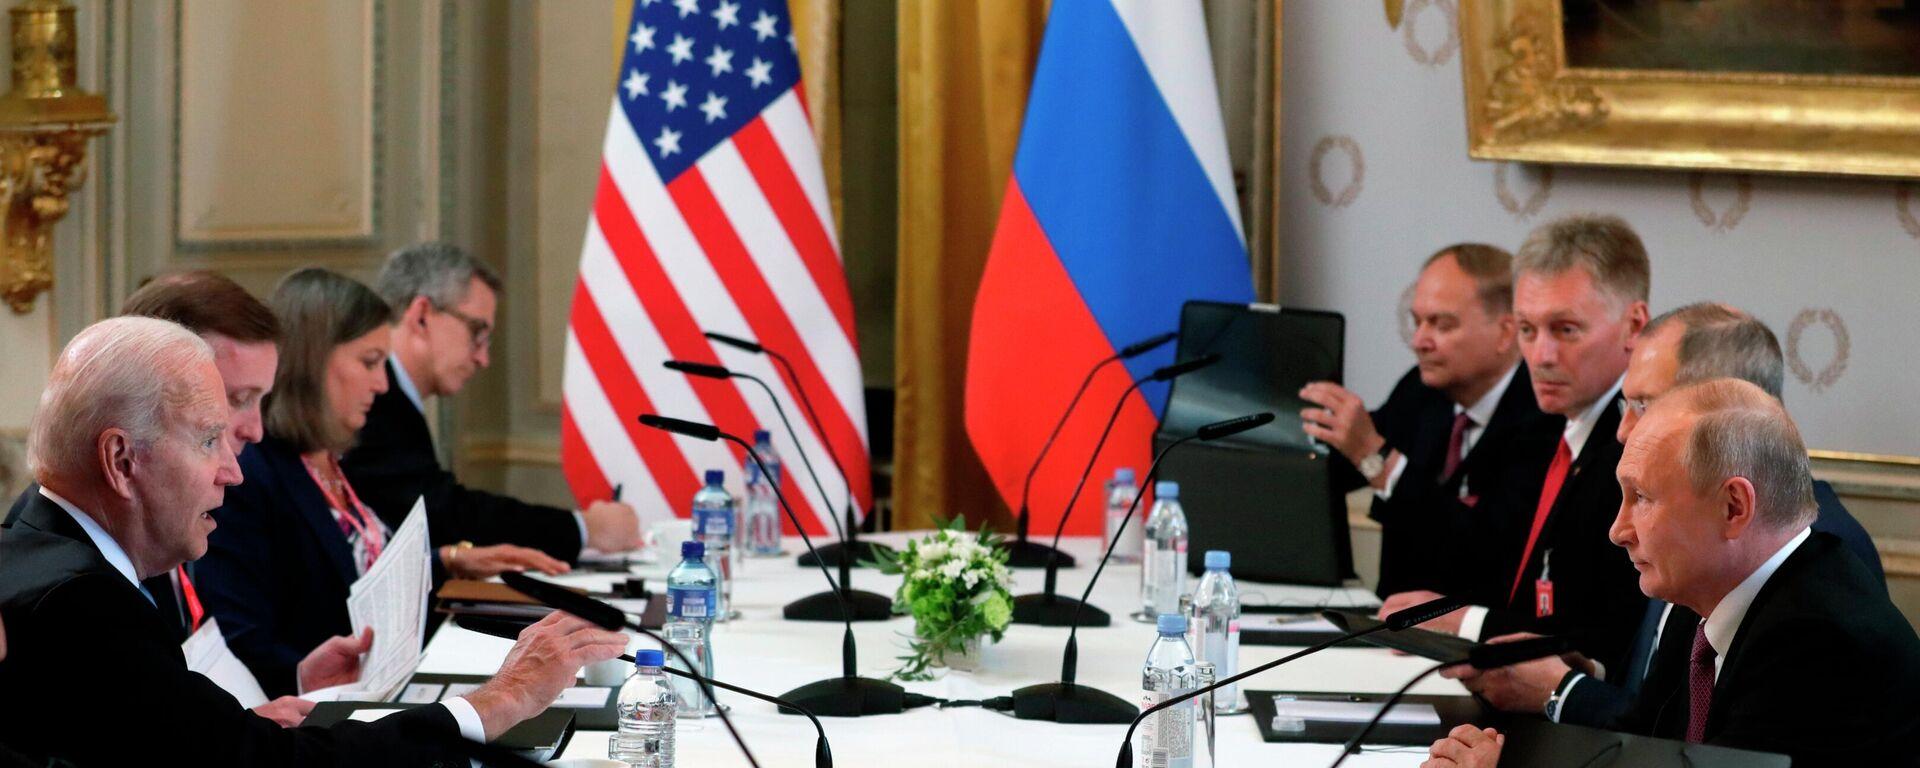 La cumbre entre Joe Biden y Vladímir Putin en Ginebra - Sputnik Mundo, 1920, 17.06.2021